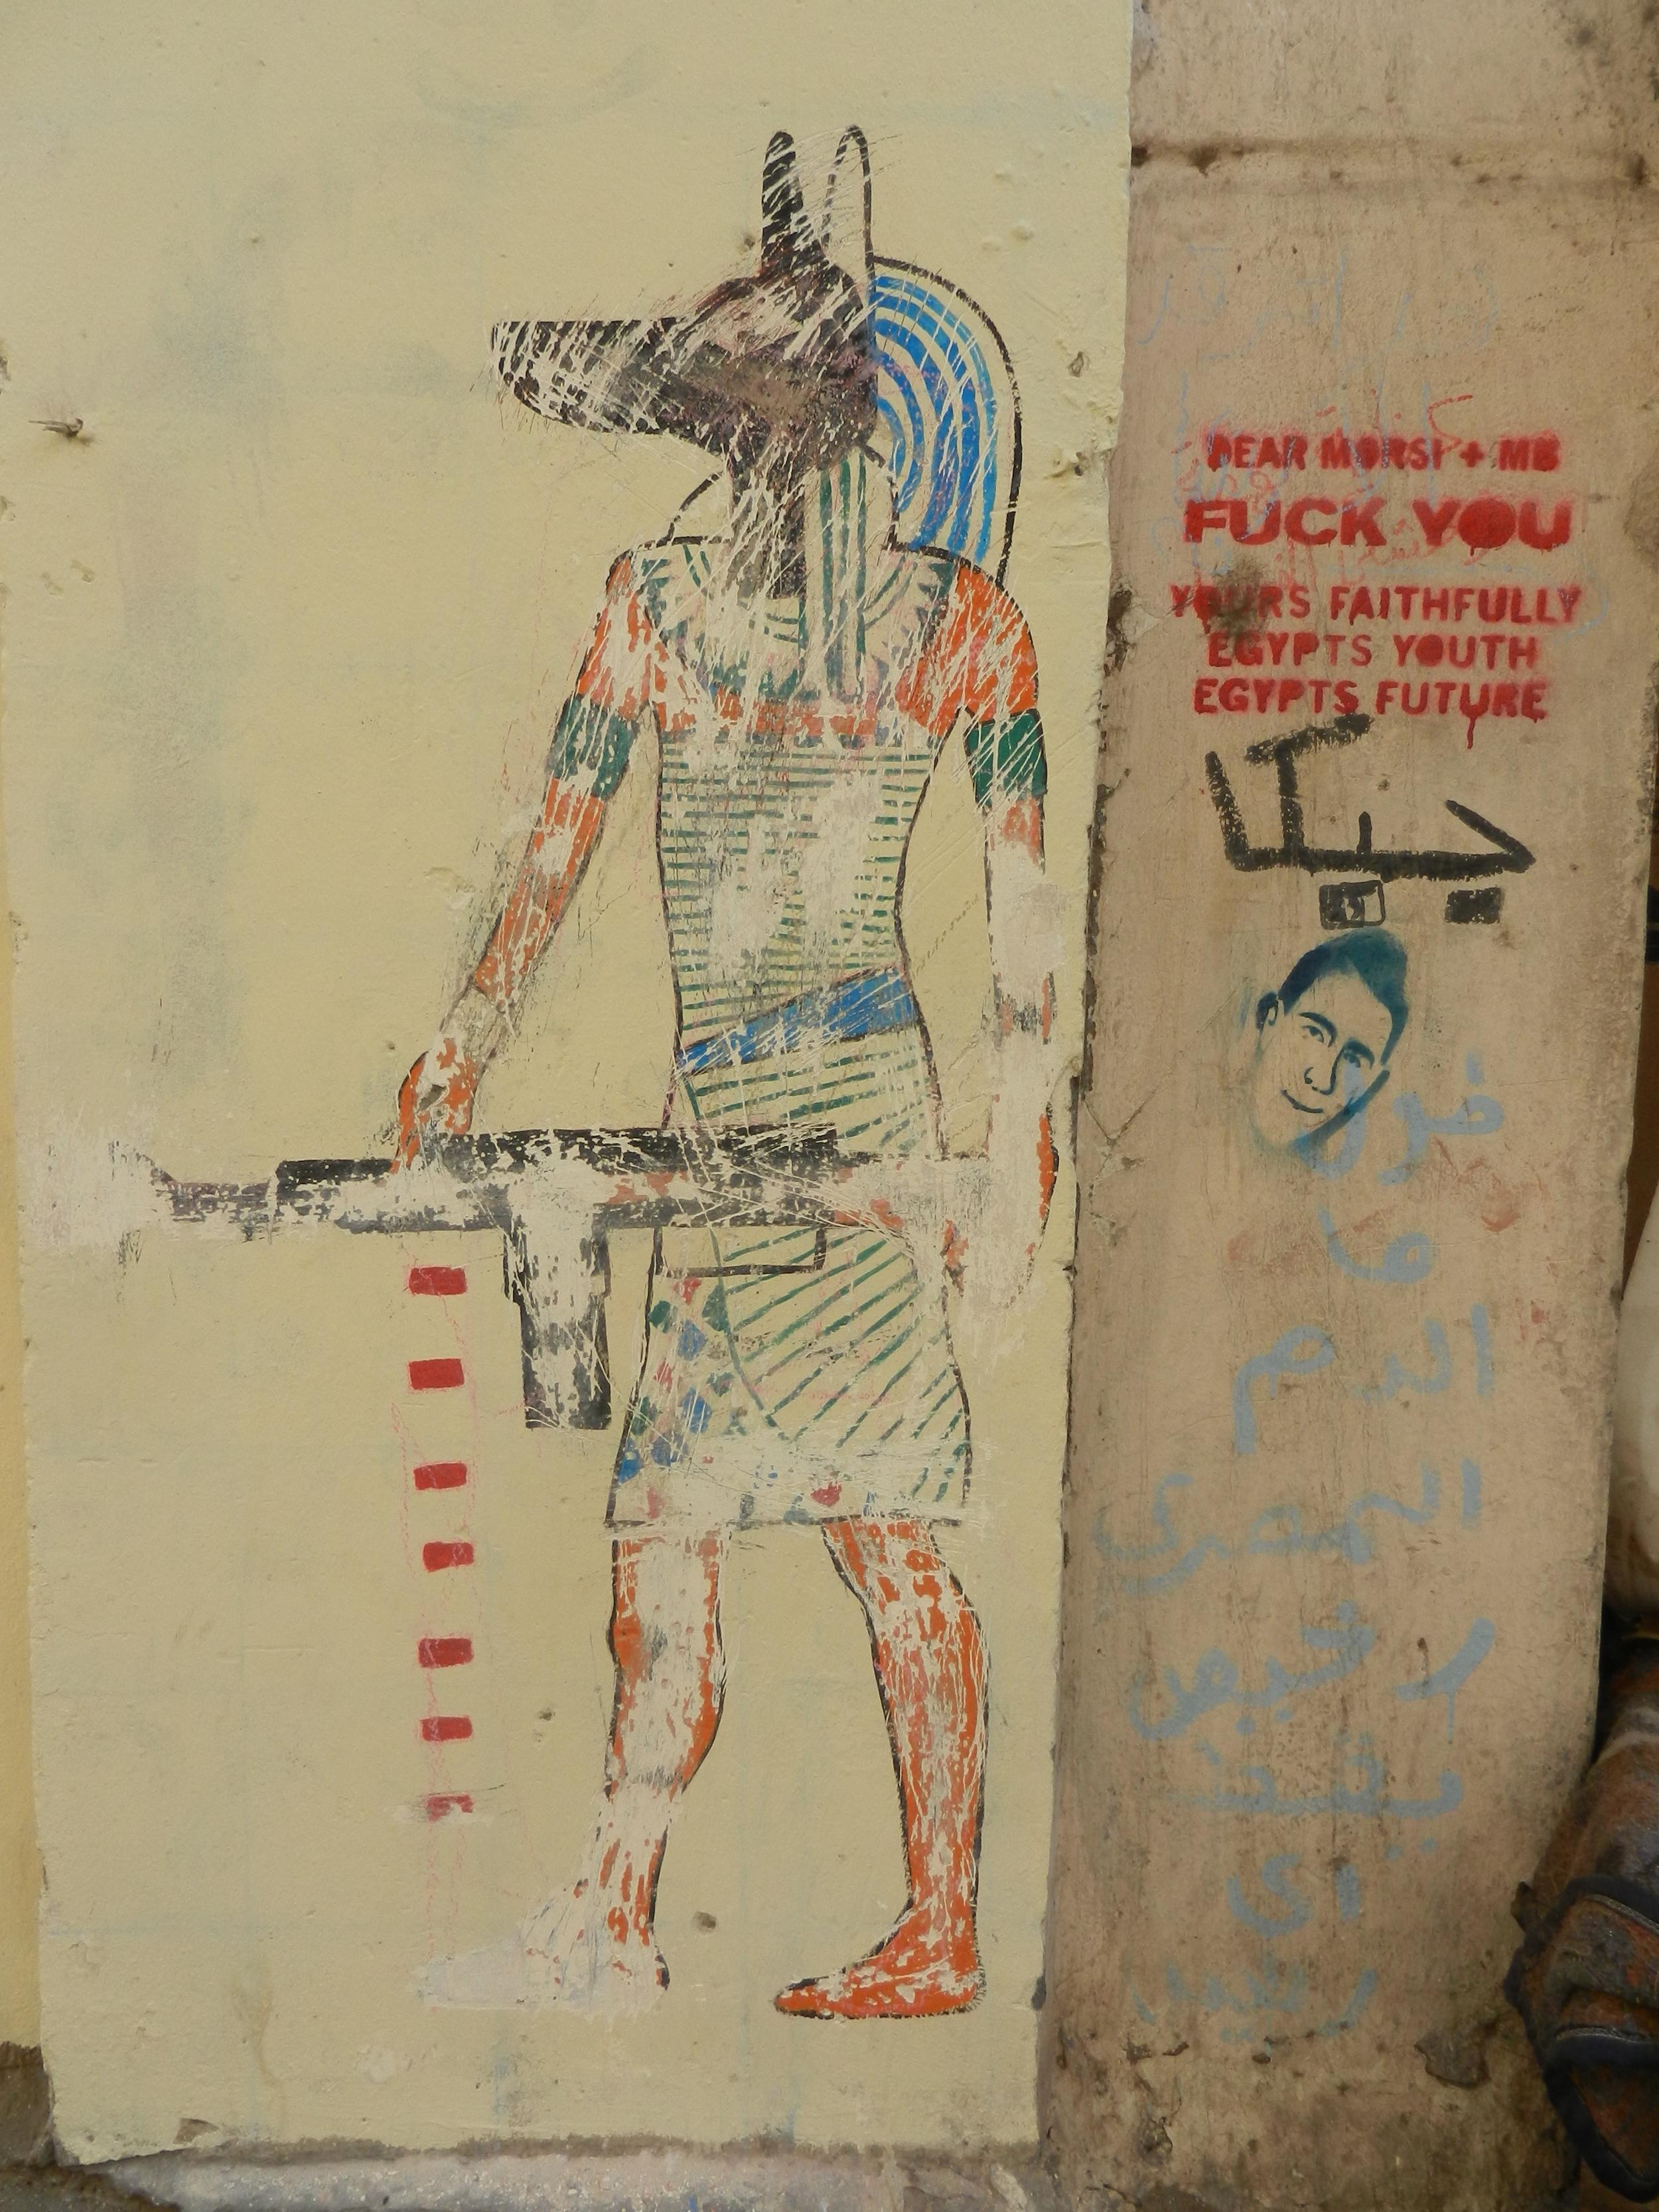 Cairo Graffito. ©Elliott Colla (2014)